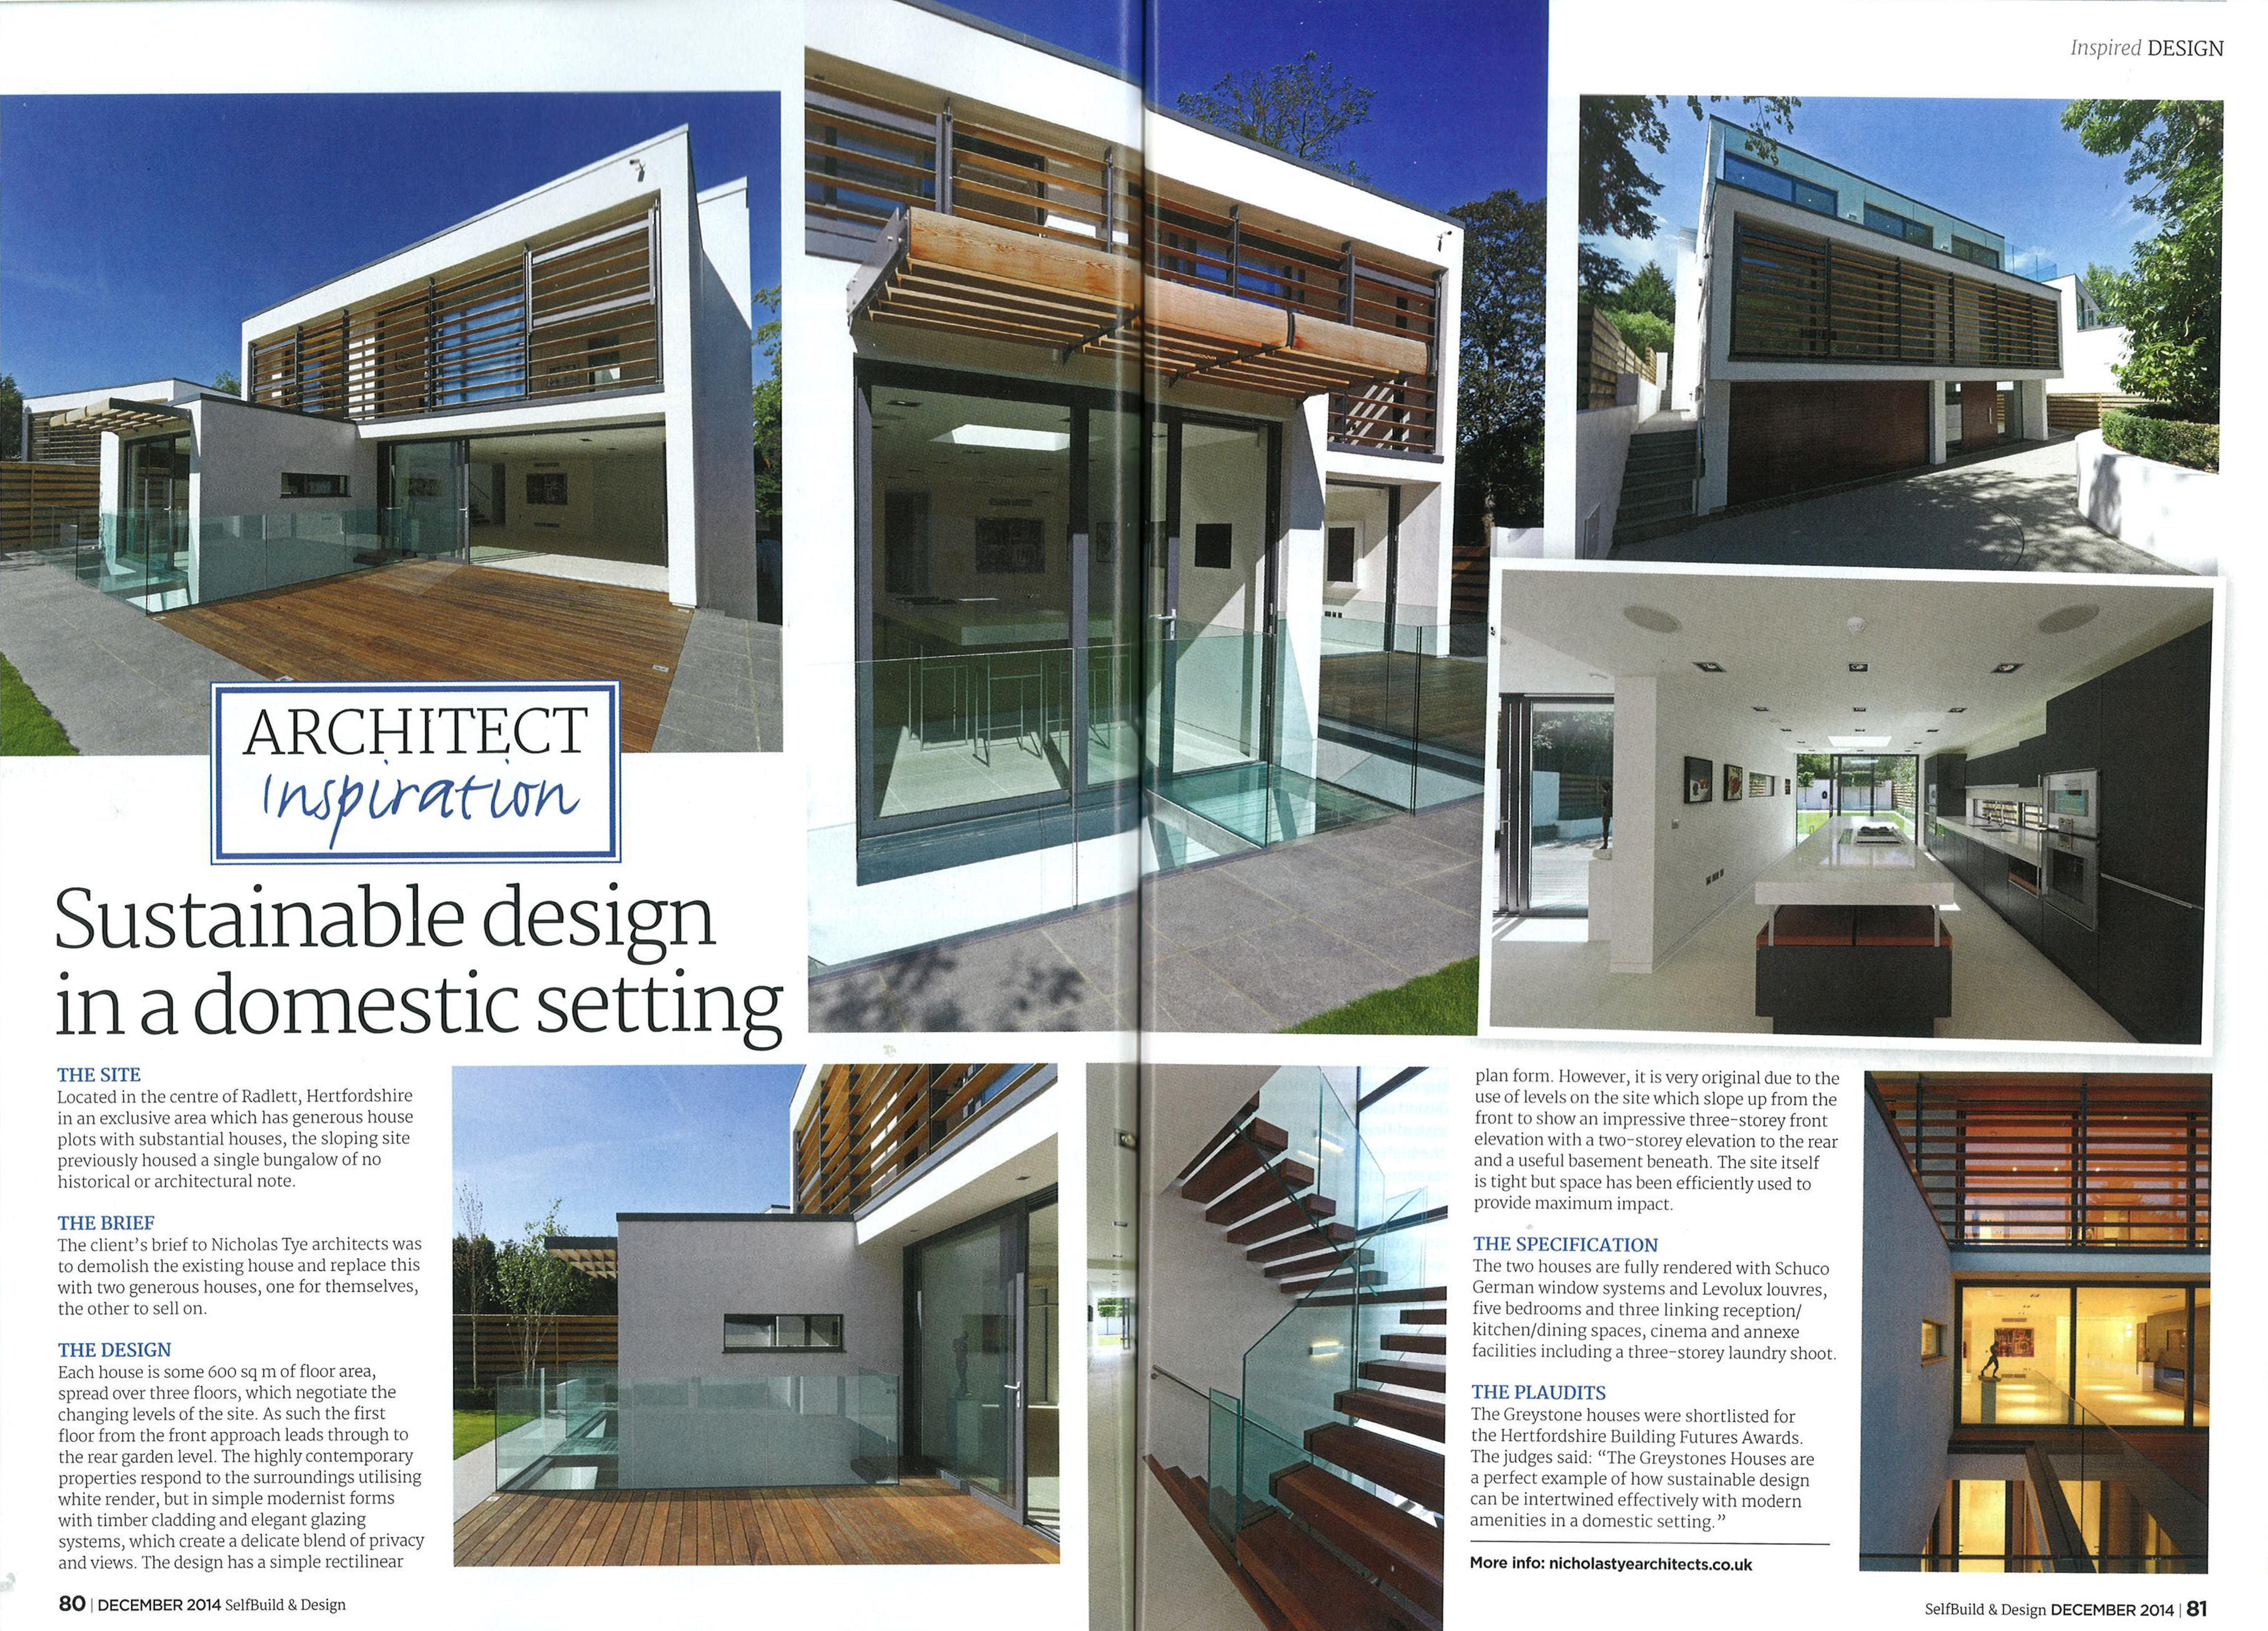 selfbuild design december 2014 nicolas tye architects. Black Bedroom Furniture Sets. Home Design Ideas